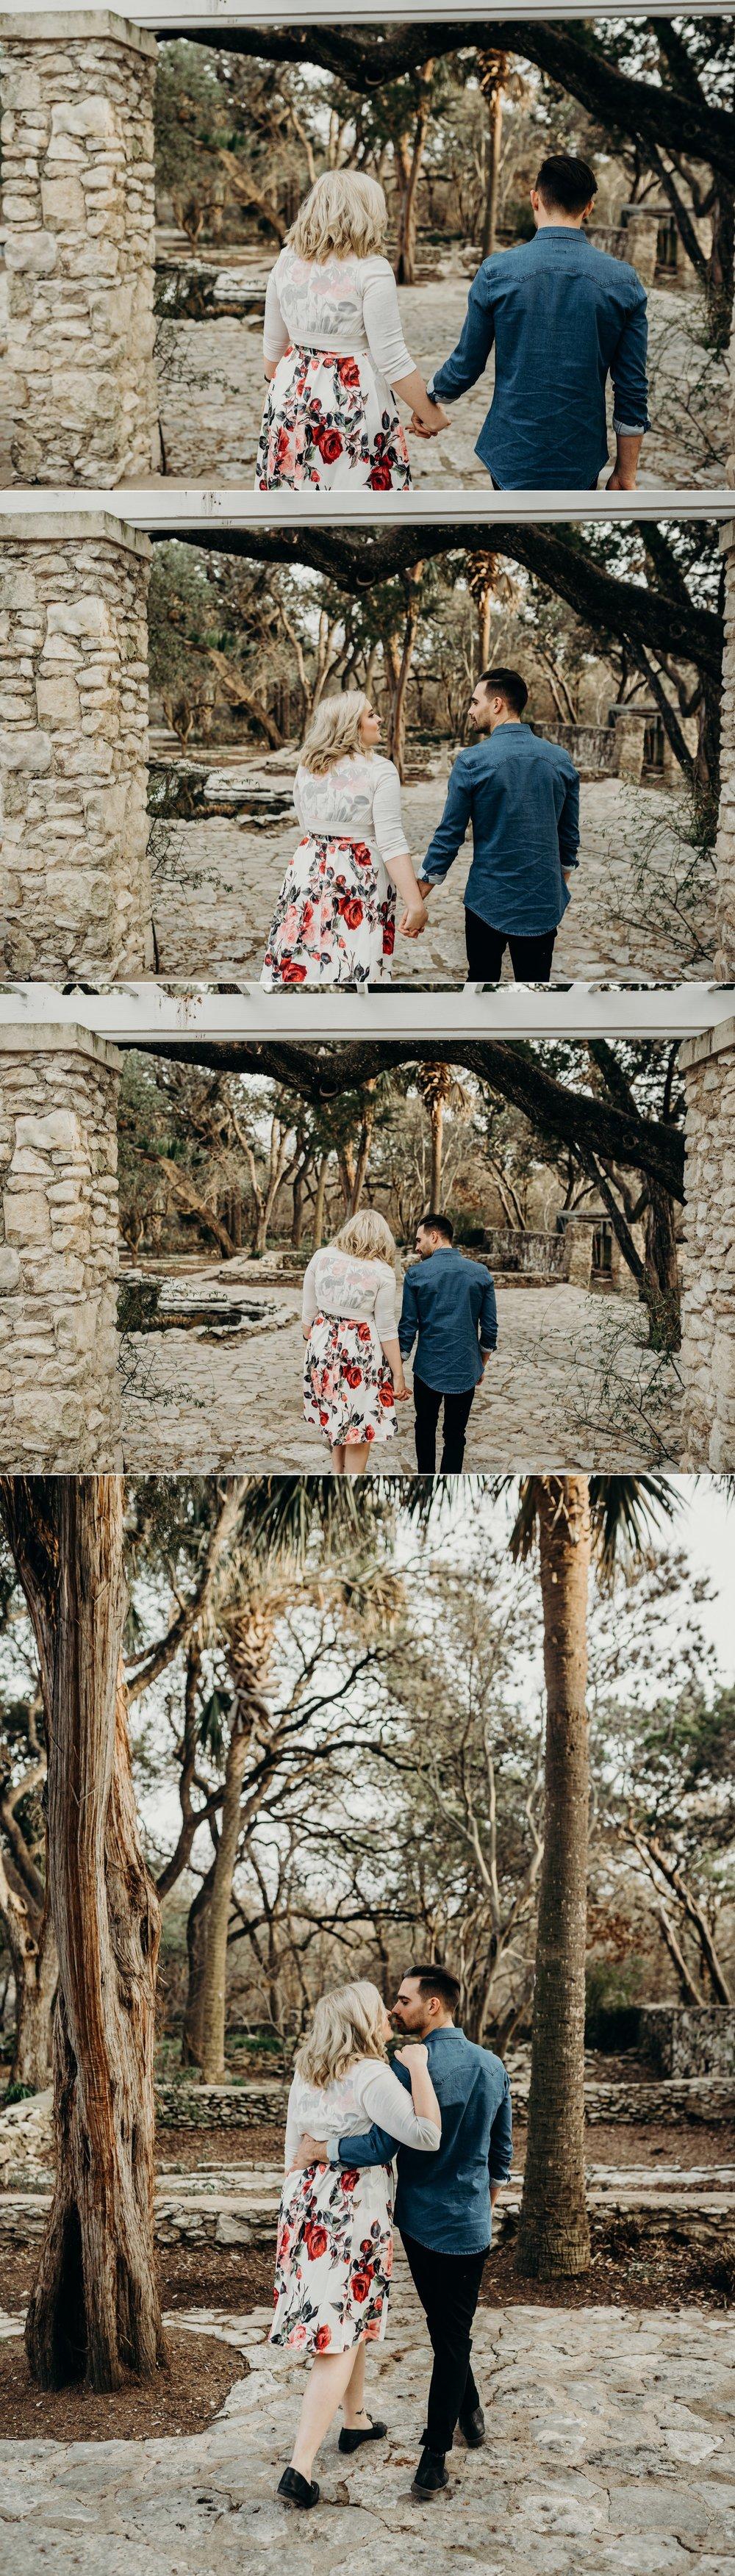 drew-andrew-texas-austin-minnesota-minneapolis-wedding-photographer-destination-elopement-intimate-adventurous_0088.jpg